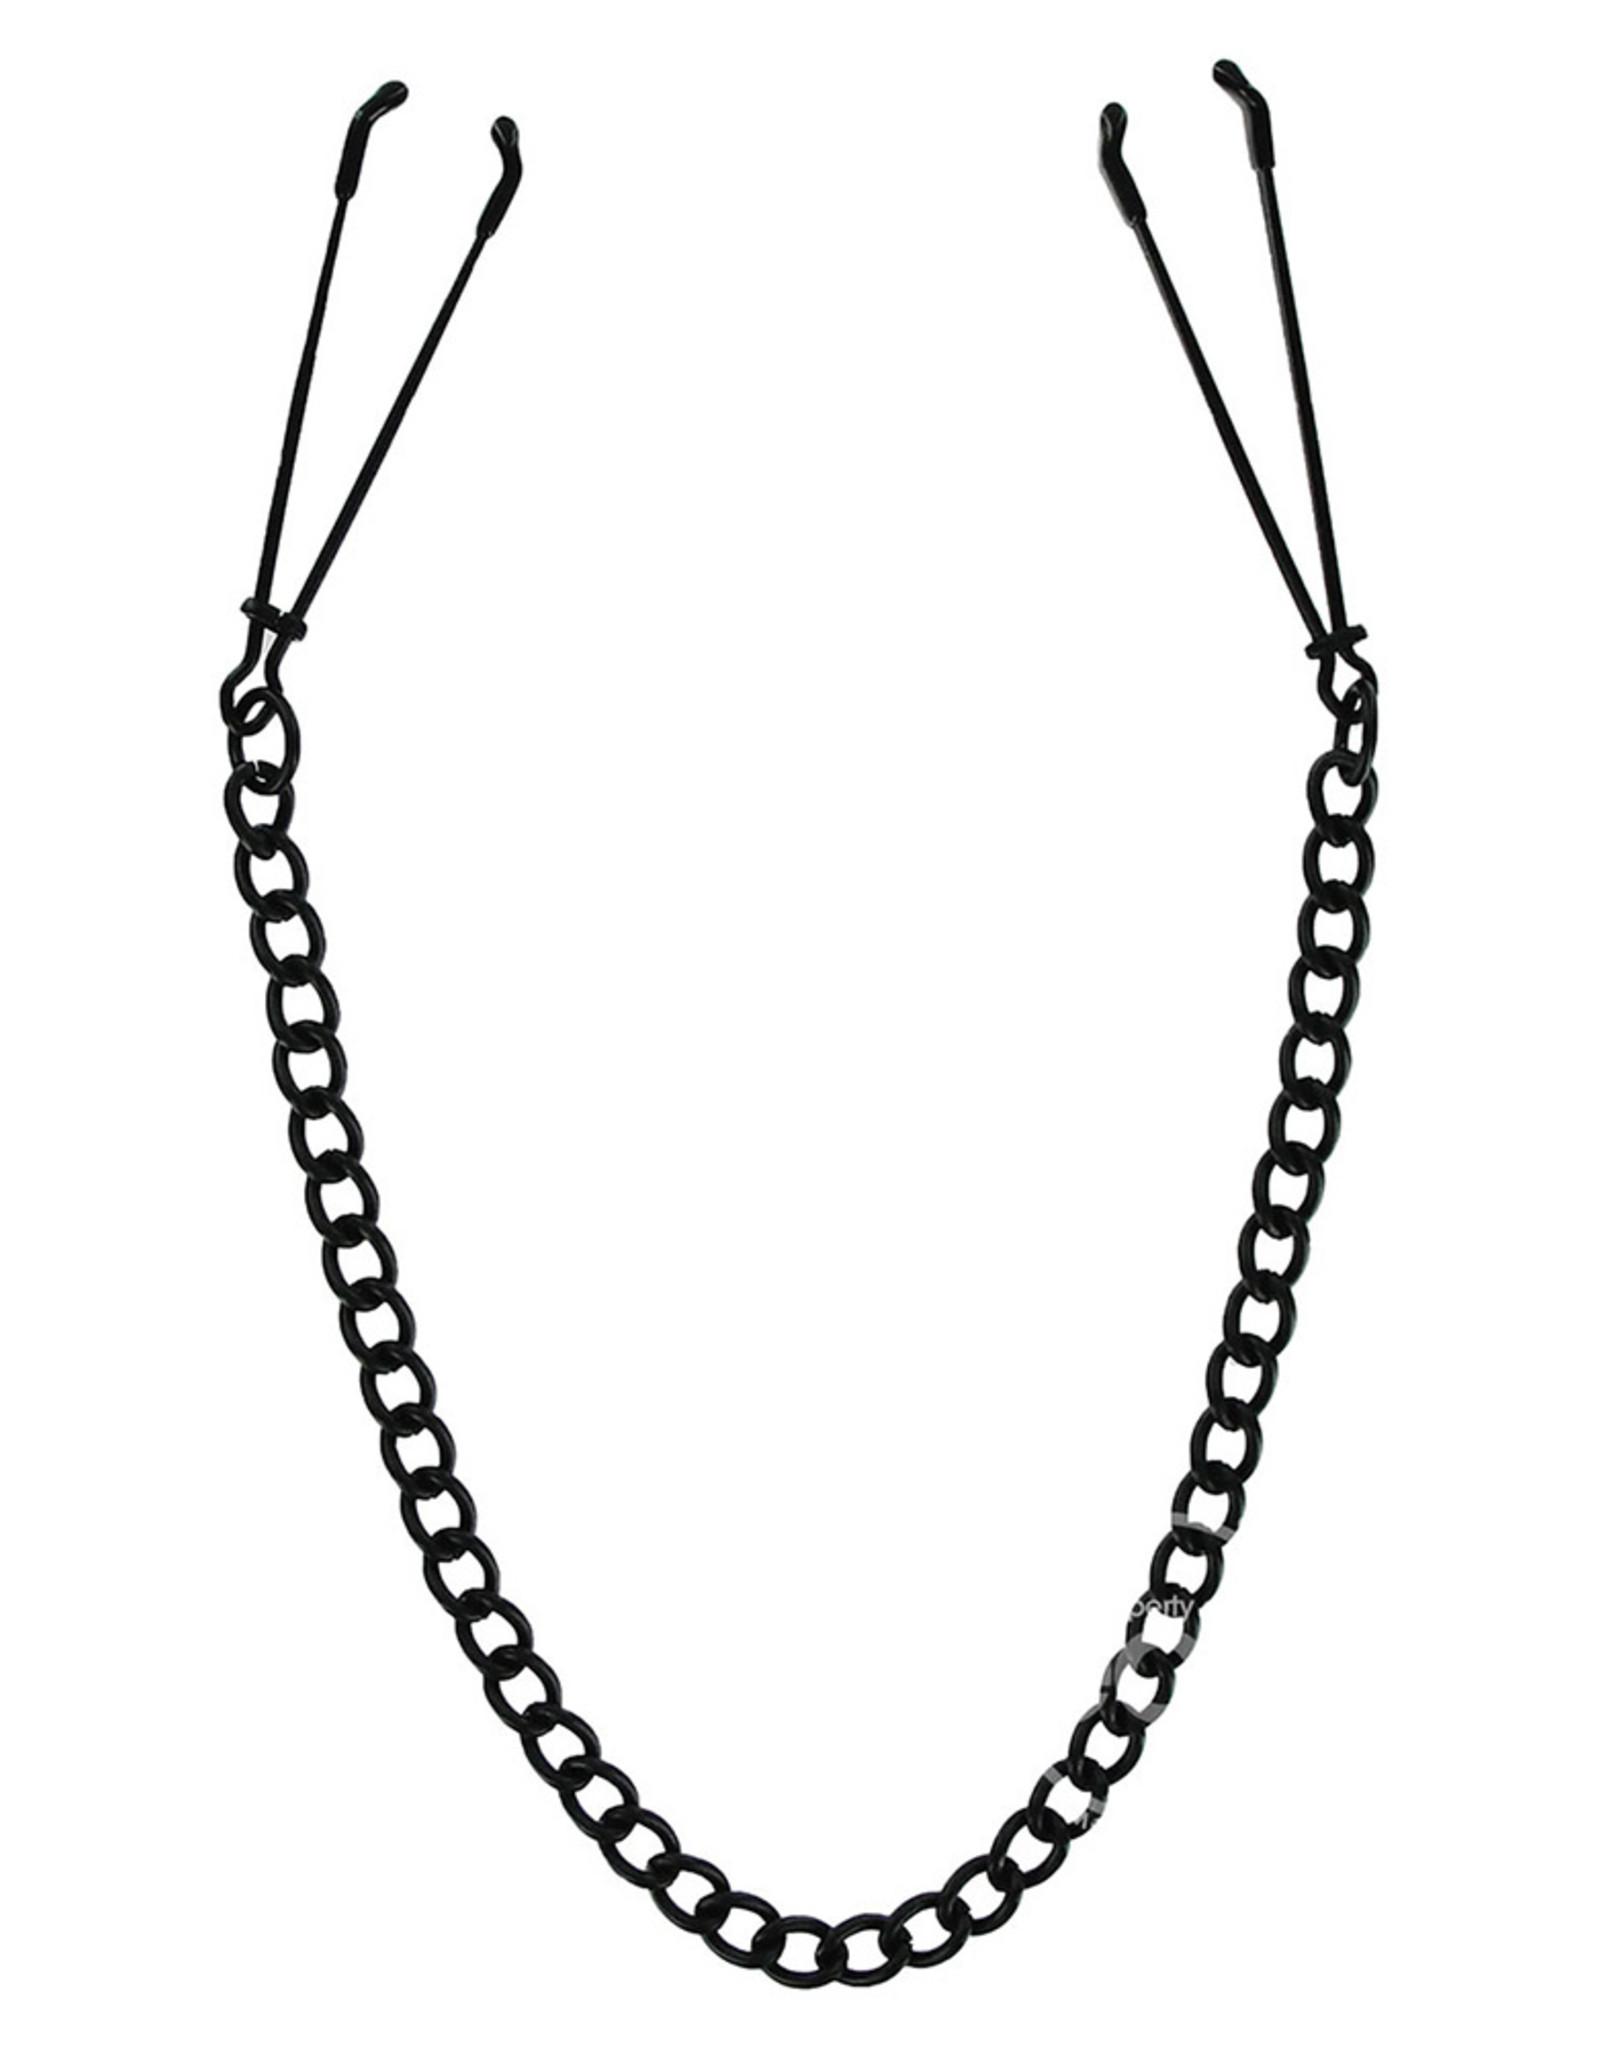 Master Series Tweezer Tip Nipple Clamp - Black Chain